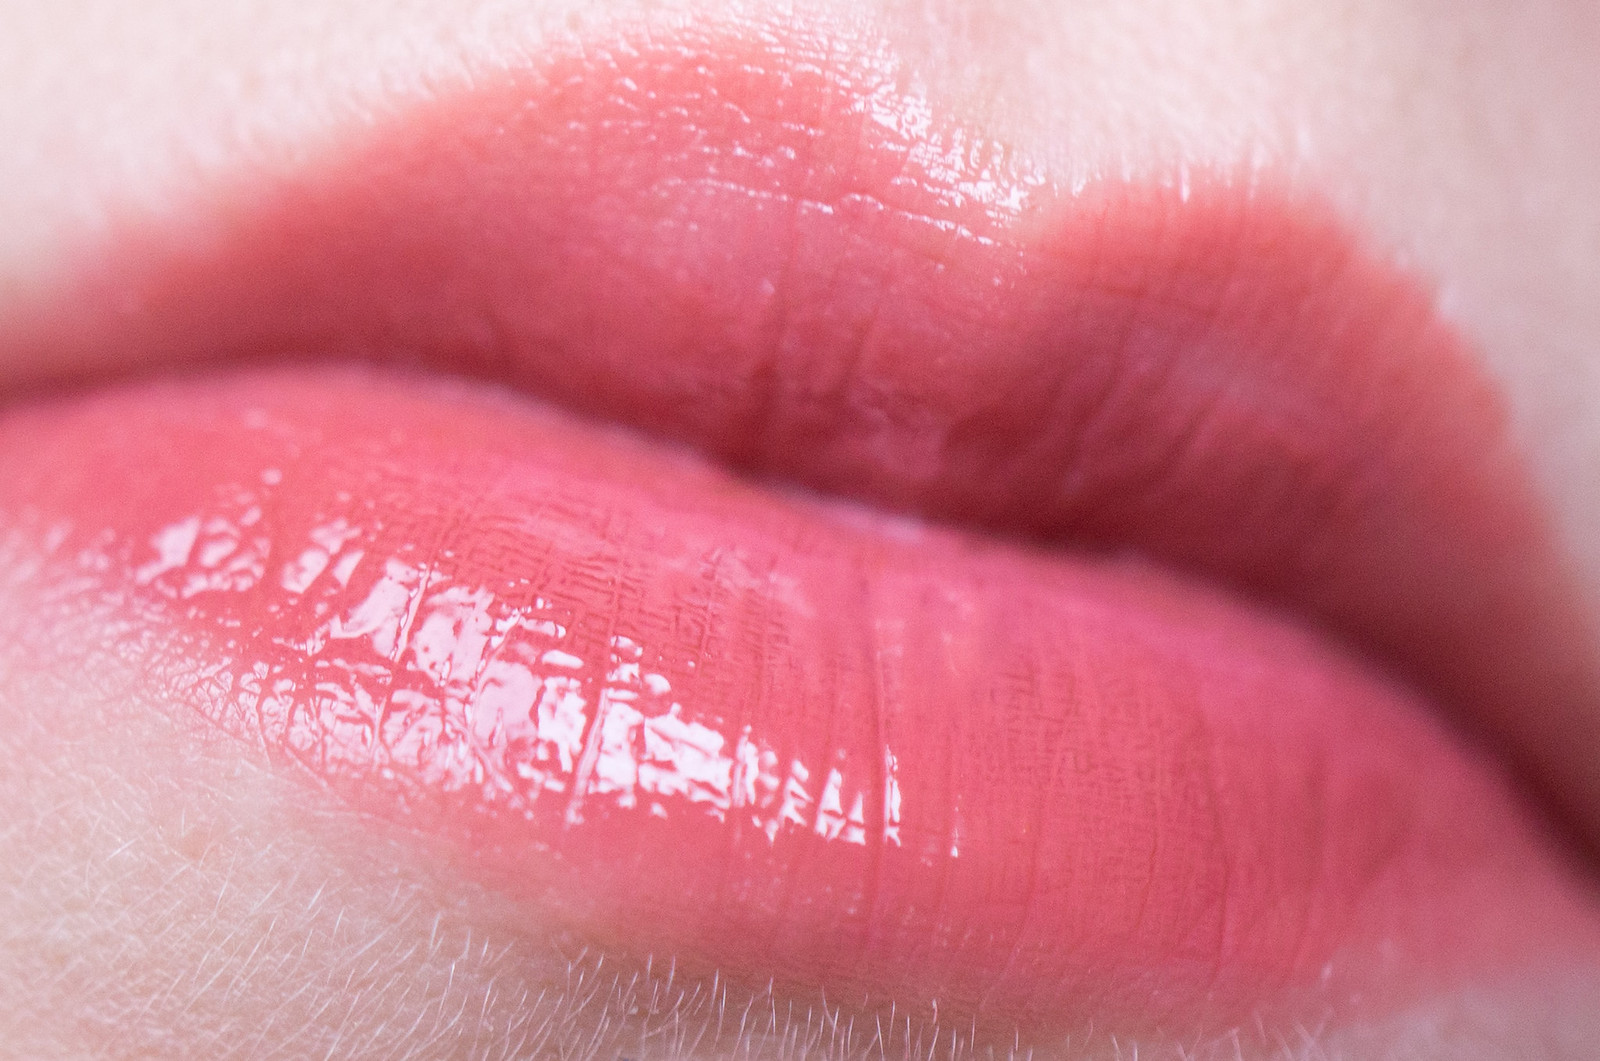 Romanovamakeup Sexy Gloss Tint Nude #Dolce Vita